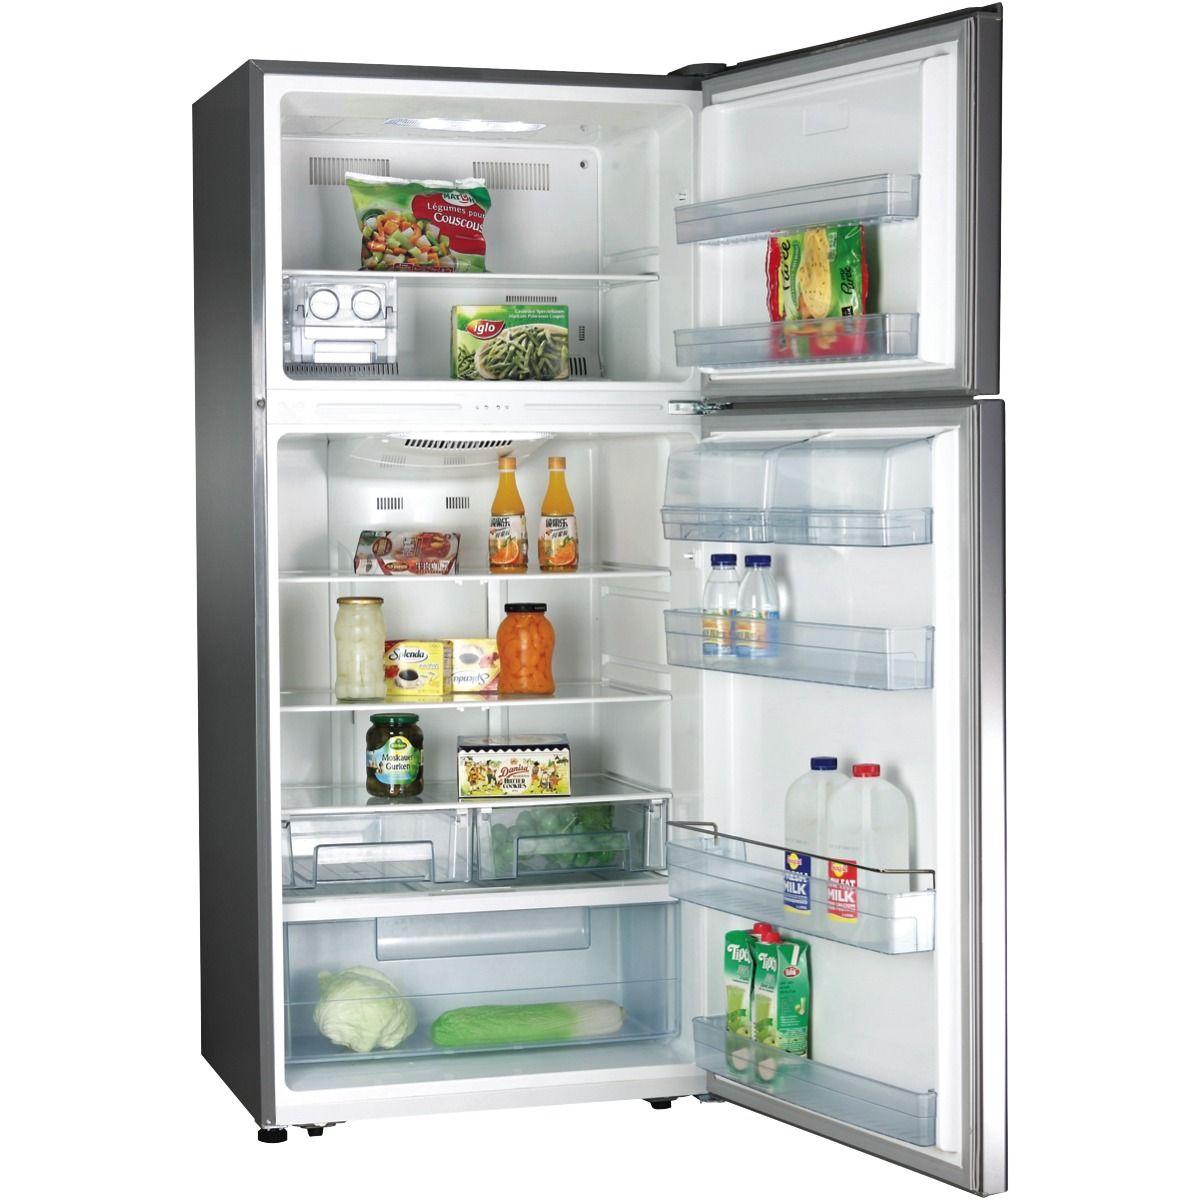 All Kind Of Home Appliances Repairing Like Washing Machine Repair Refrigerator Repair Dryer Repair Fridge Repair O Buying Appliances Home Appliances Smart Home